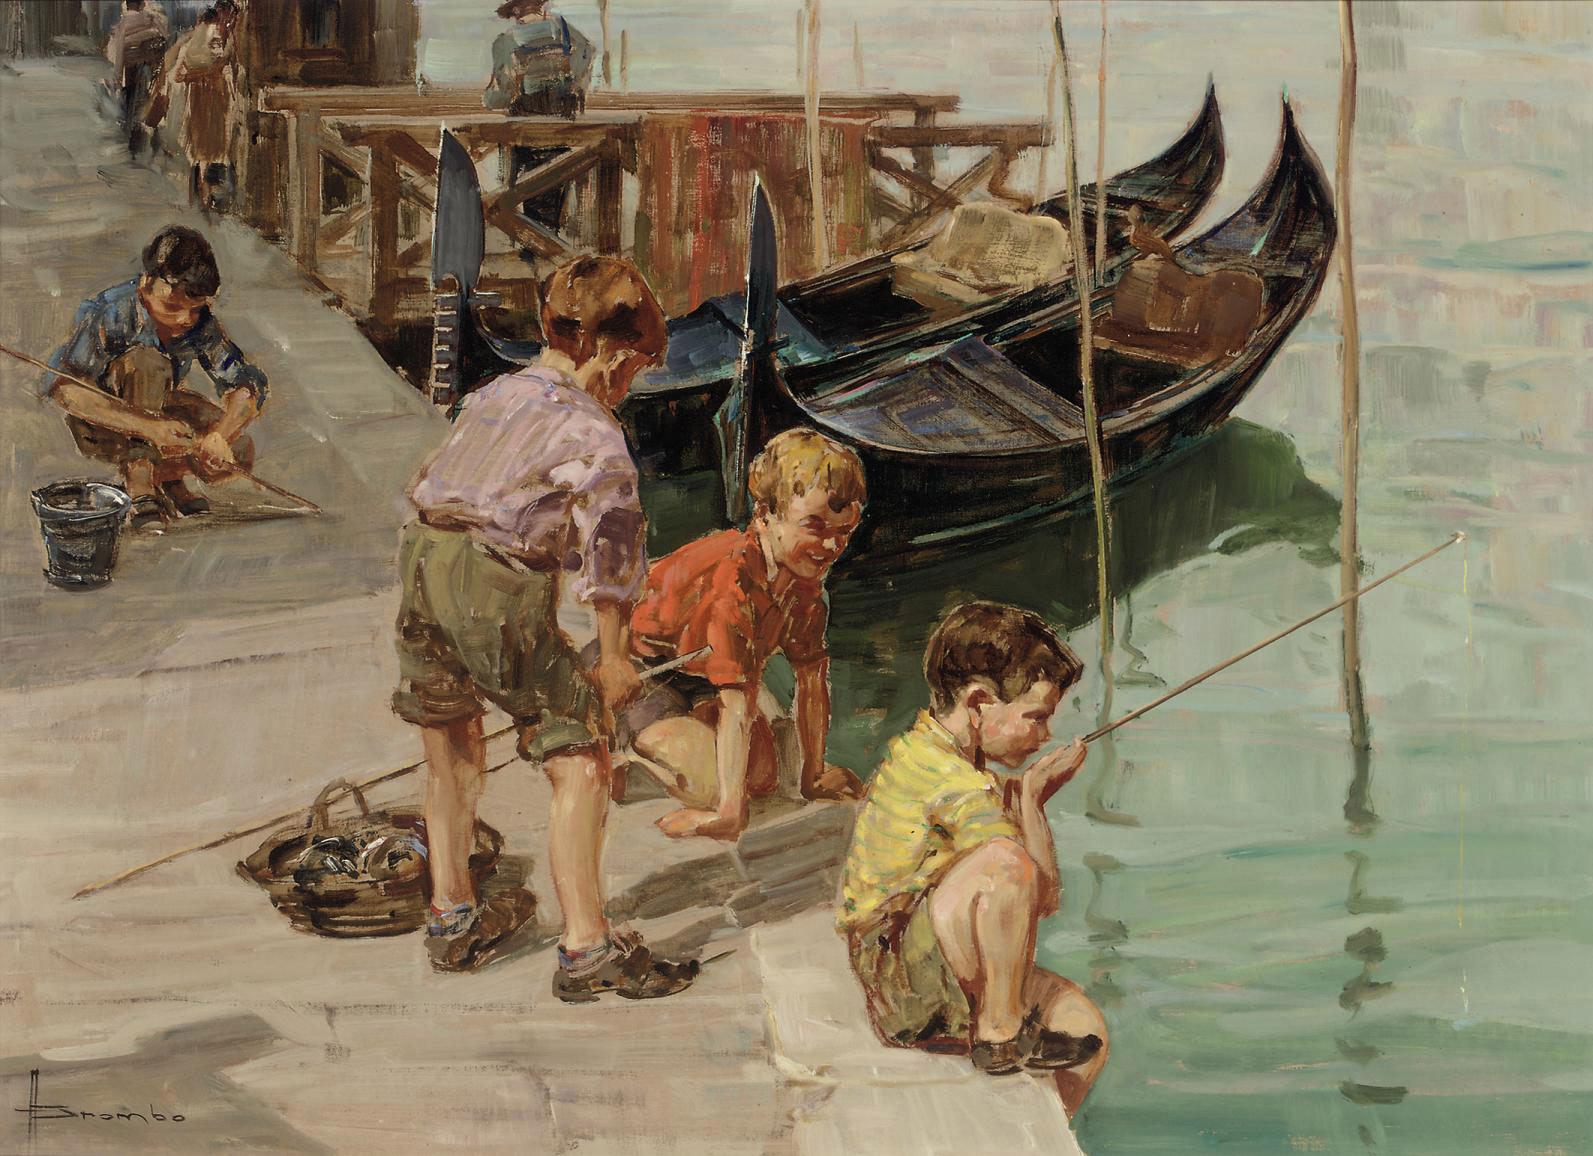 Fishing on a Venetian canal